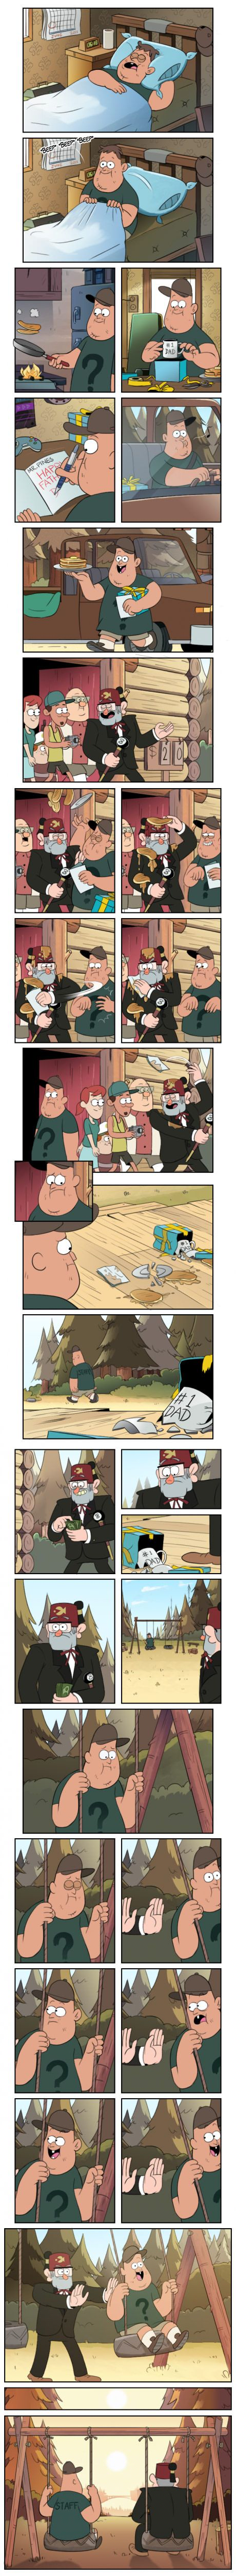 Father figure Gravity Falls fans ic by Markmak